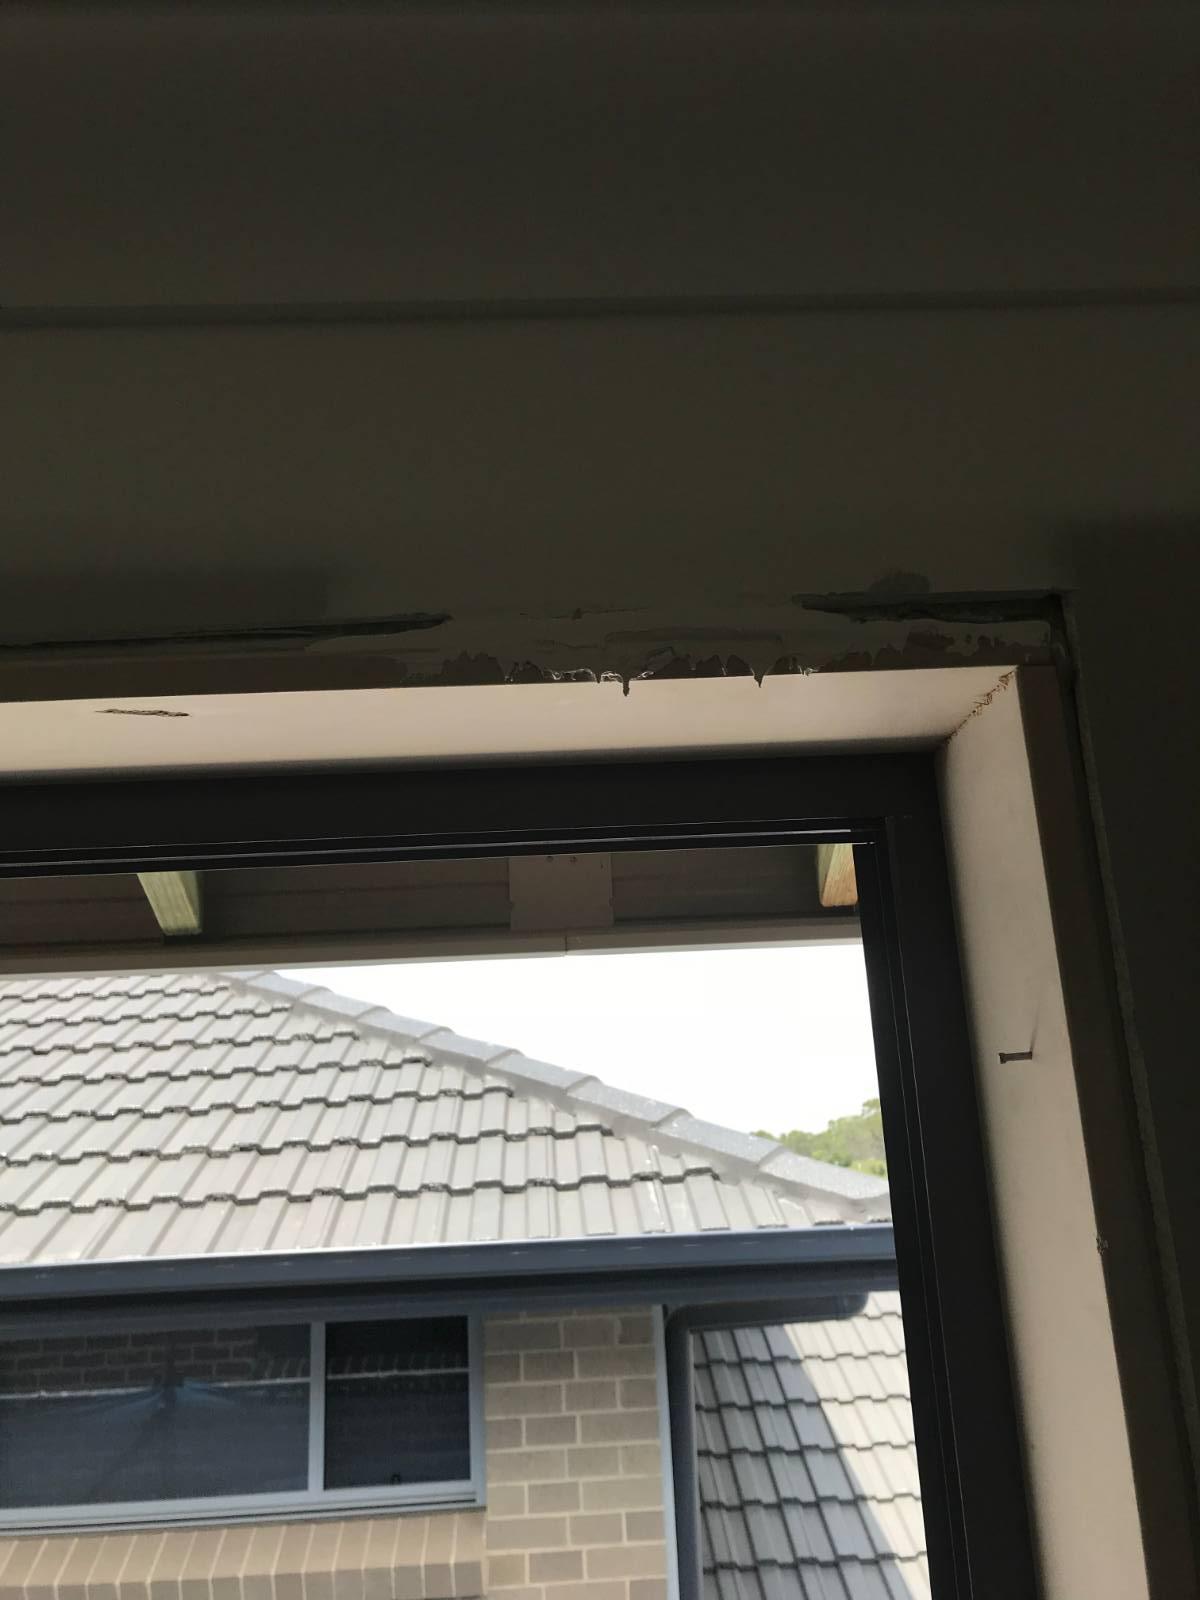 Gaps around windows during build